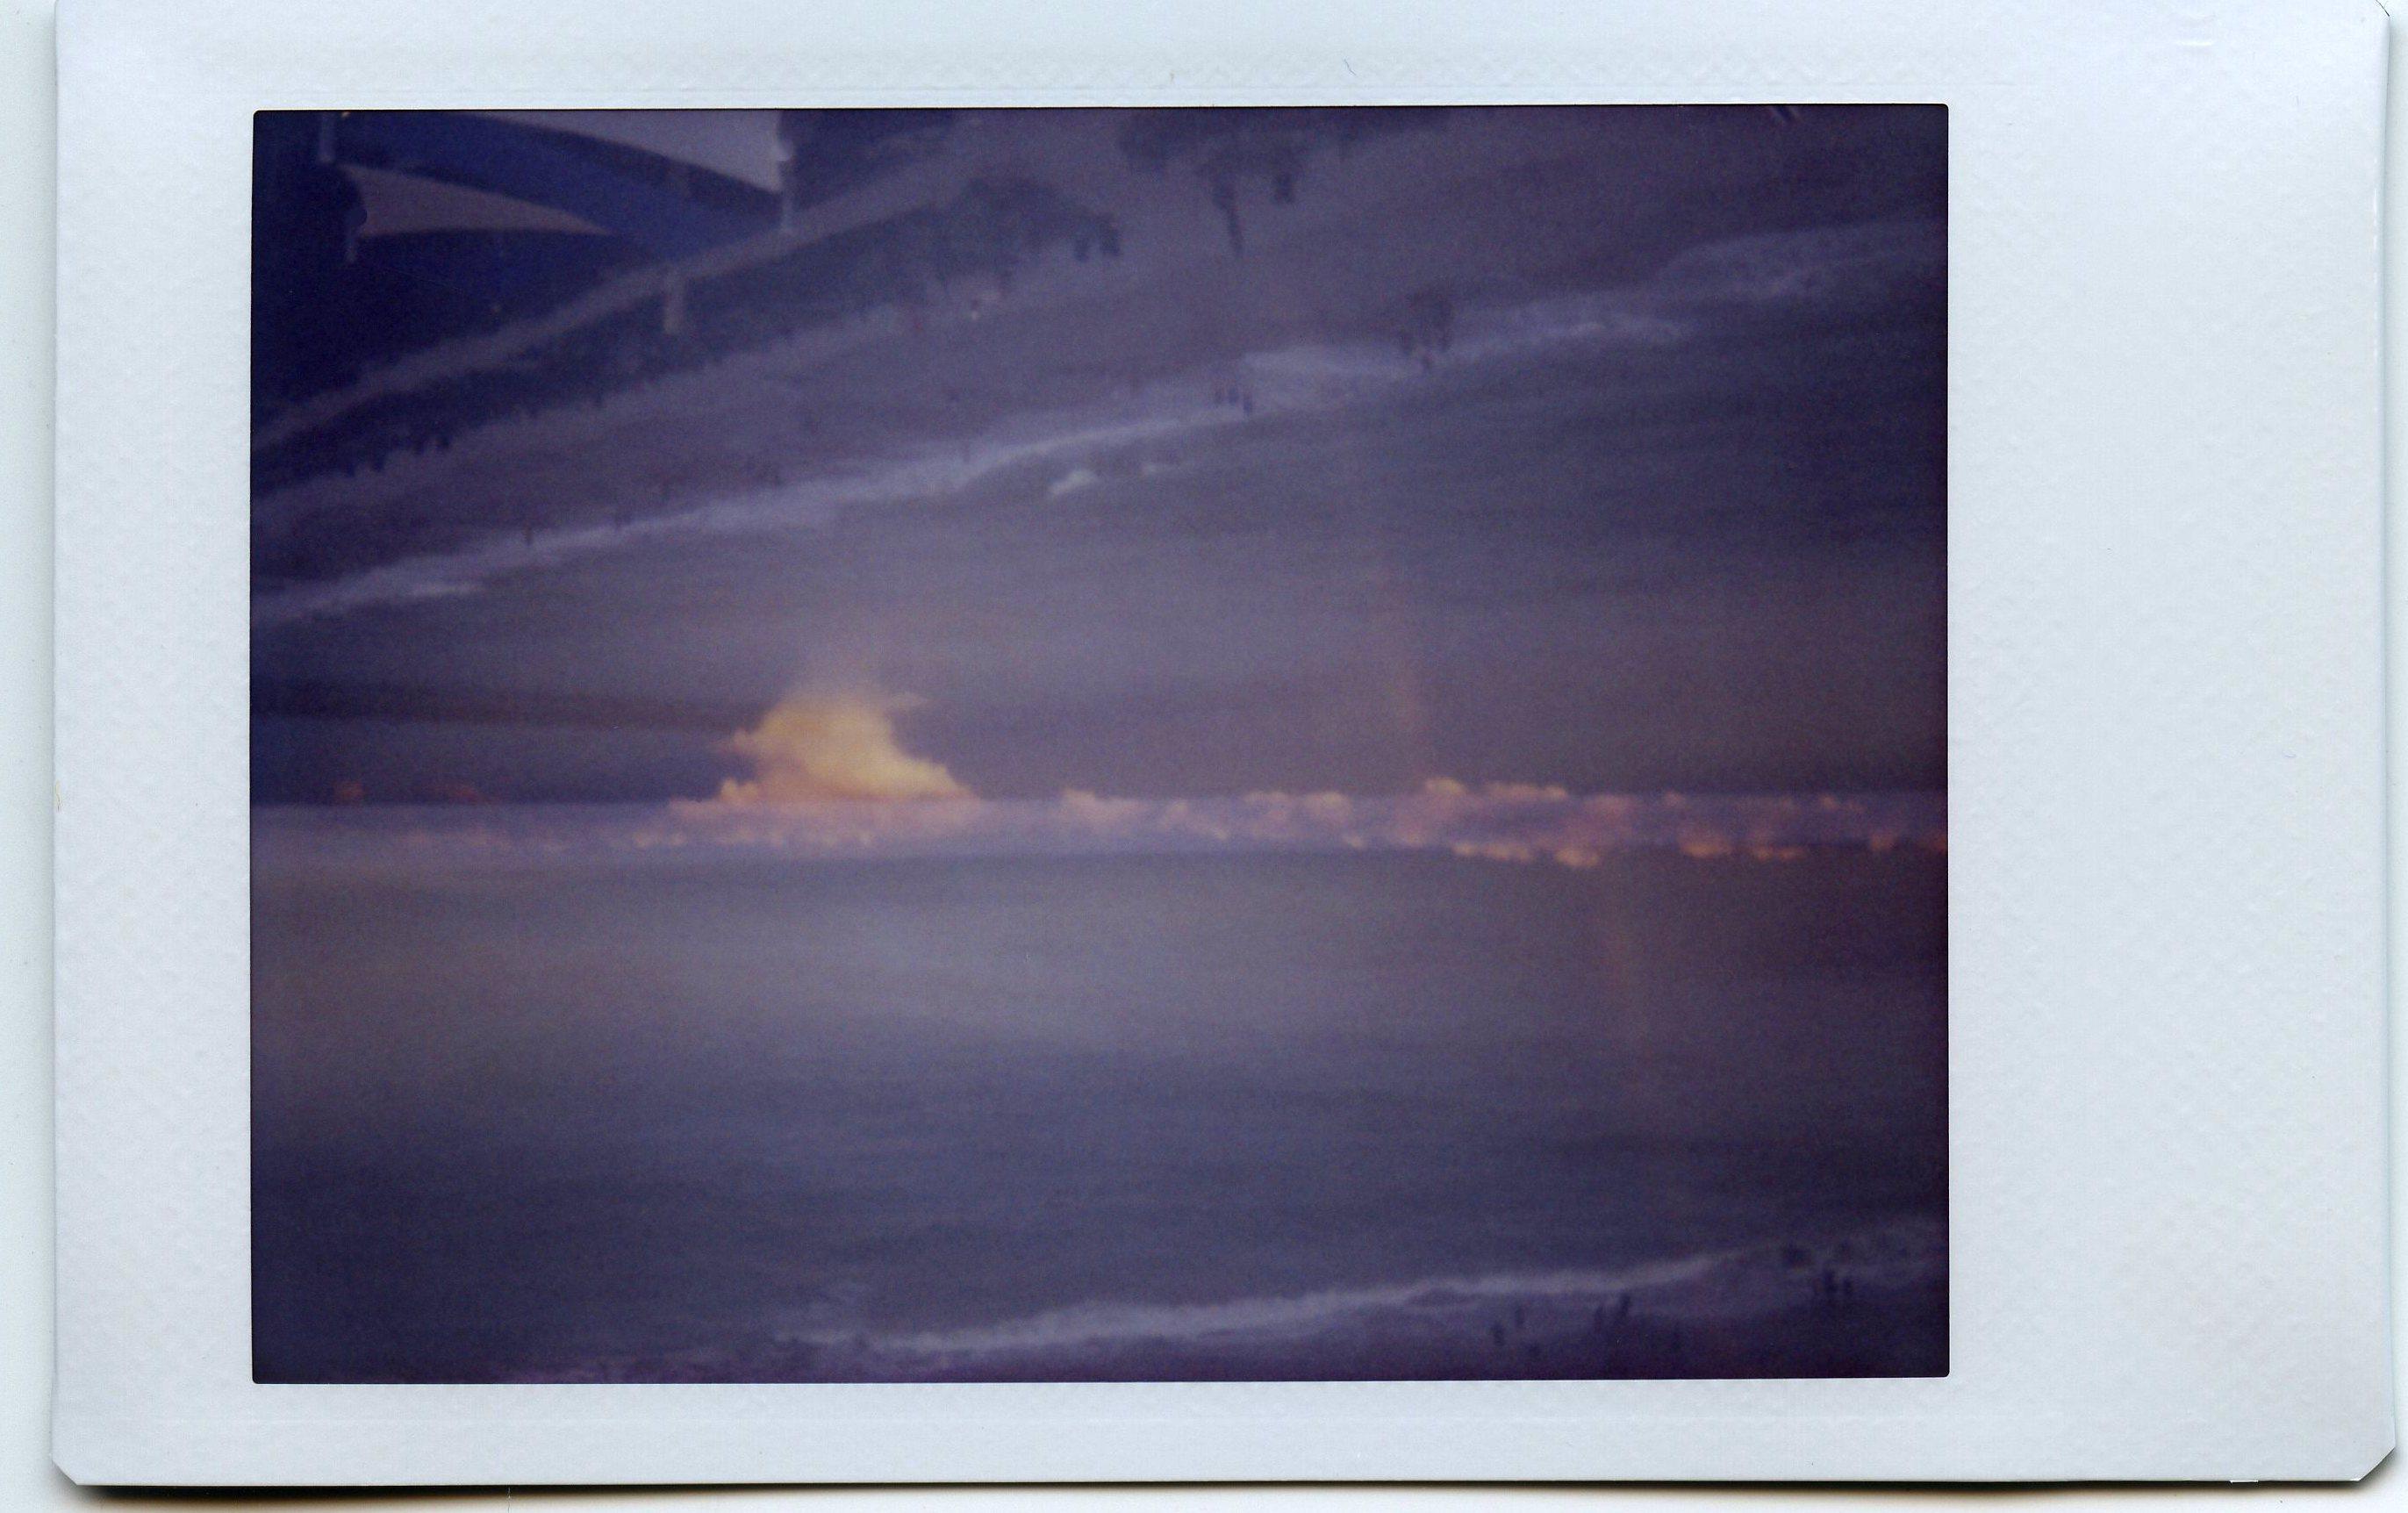 double exposure turn over